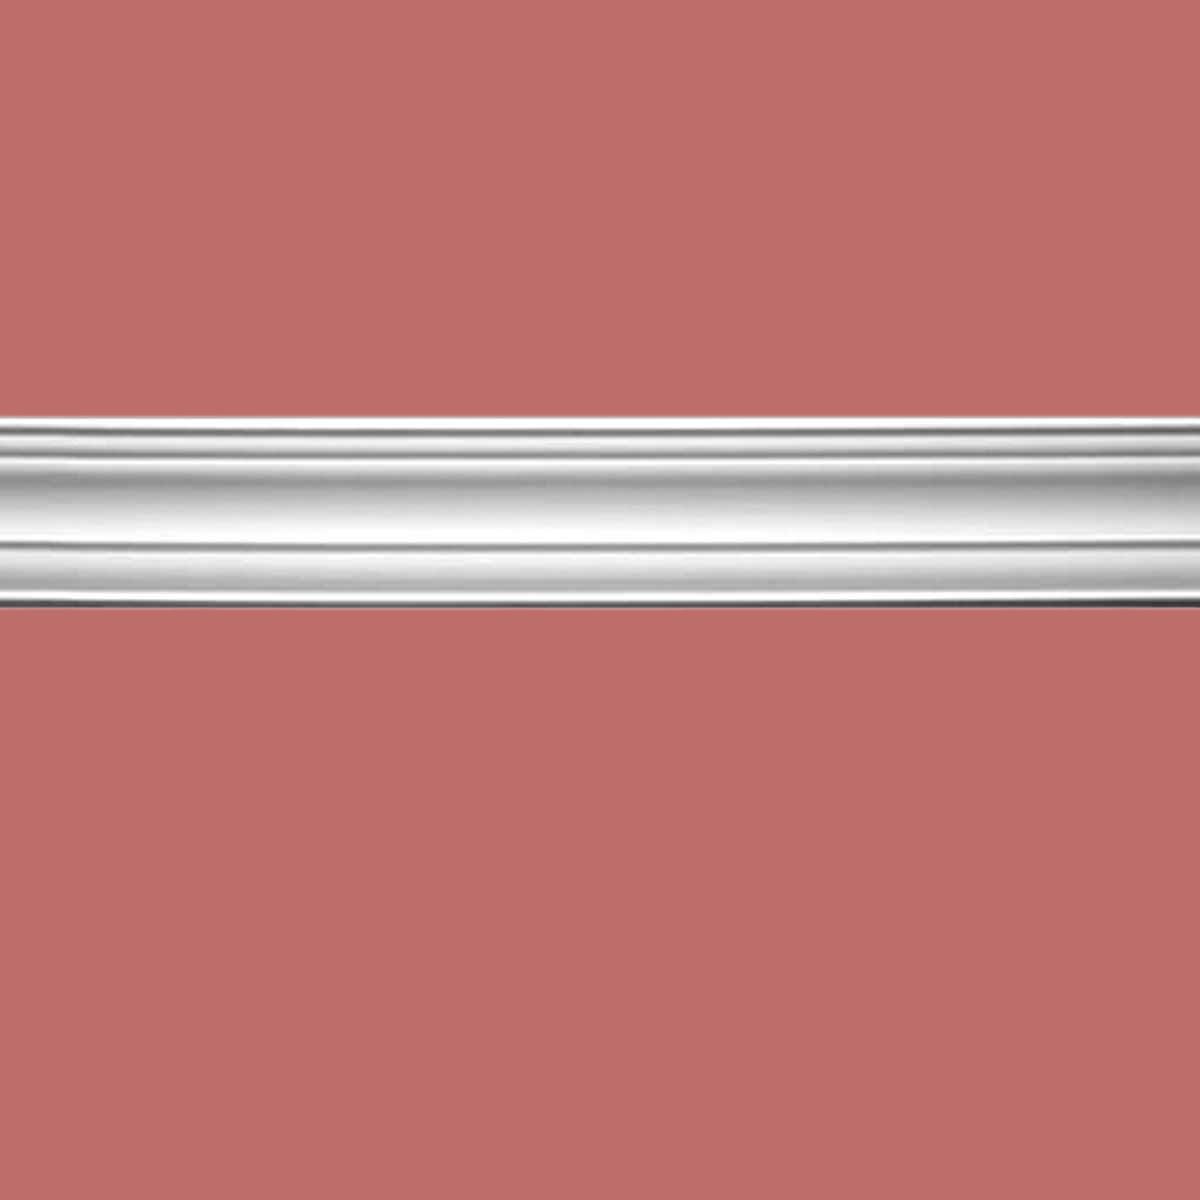 Cornice Withe Urethane Sample of 12338 24 Cornice Cornice Moulding Cornice Molding